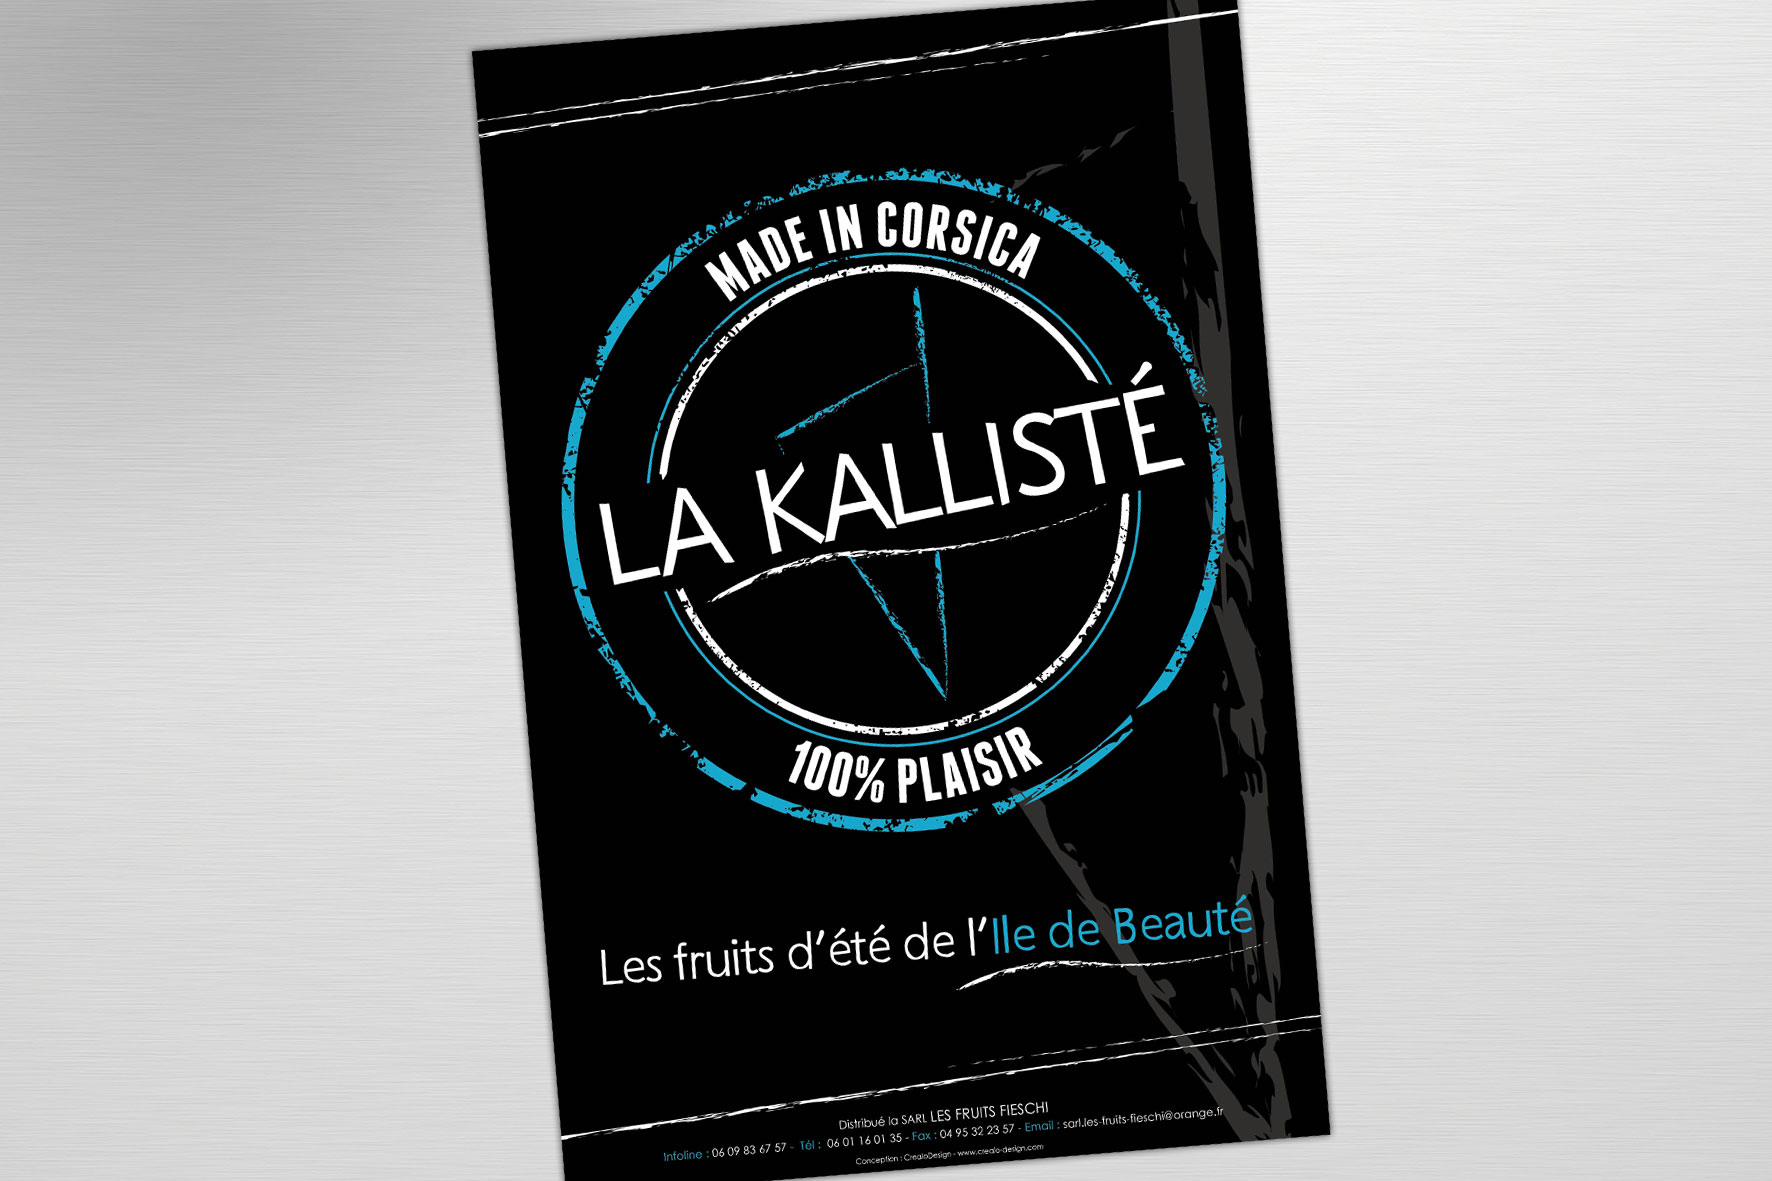 La Kallisté